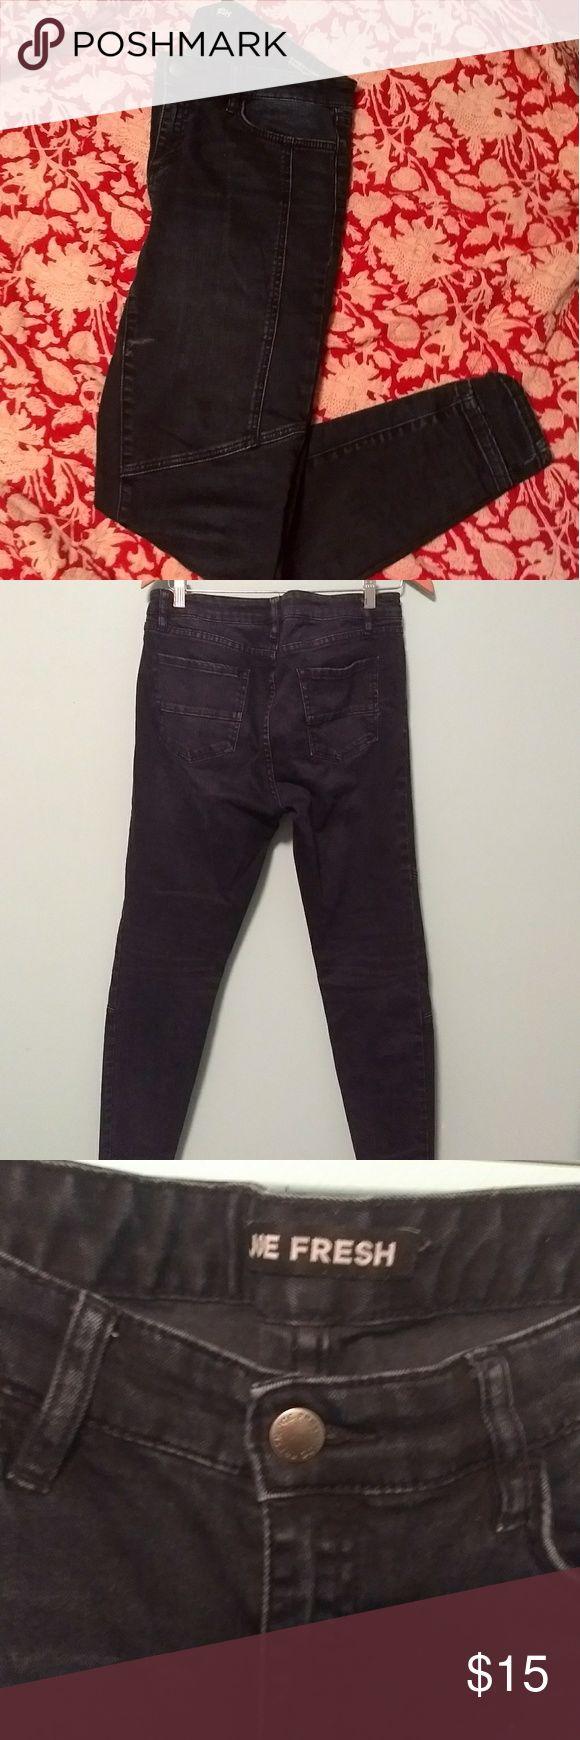 Joe Fresh Moto Jeans Size 28 Moto Jeans by the lovely Joe Fresh.   Barely worn, excellent condition. Good quality thick denim. Joe Fresh Jeans Straight Leg